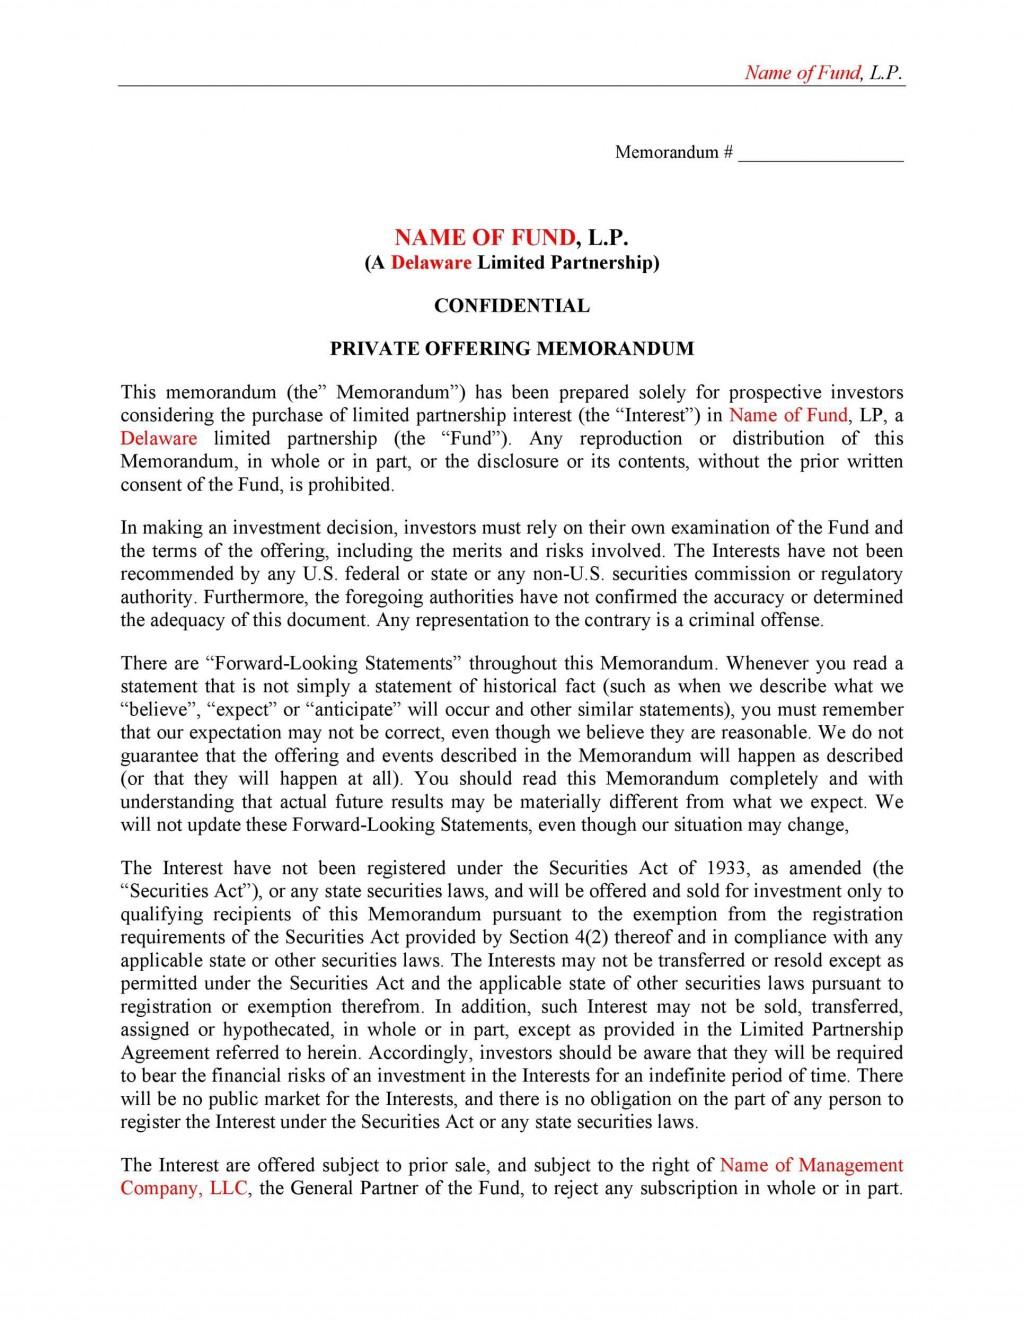 006 Fascinating Private Placement Memorandum Sample High Definition  Samples Template Singapore PdfLarge